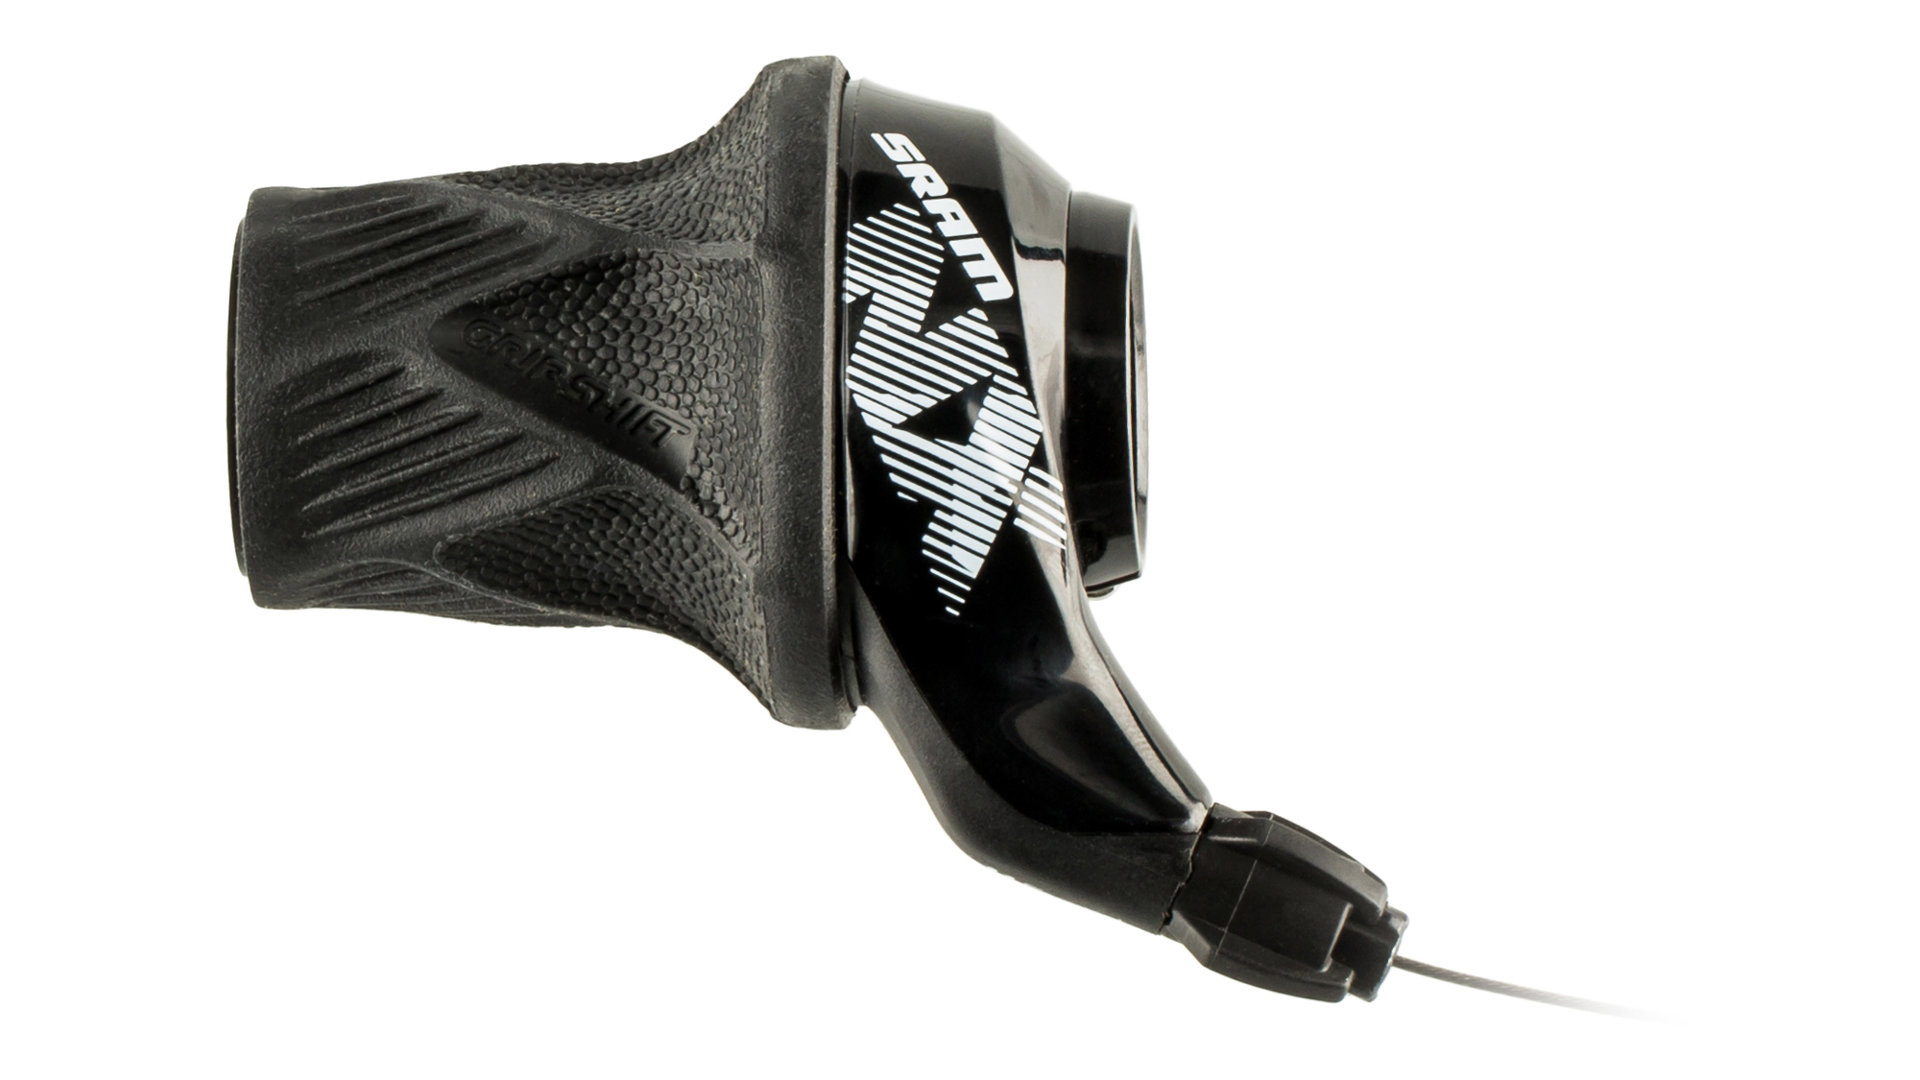 SRAM NX 11 speed GripShift sort 00.7018.292.000 | item_misc